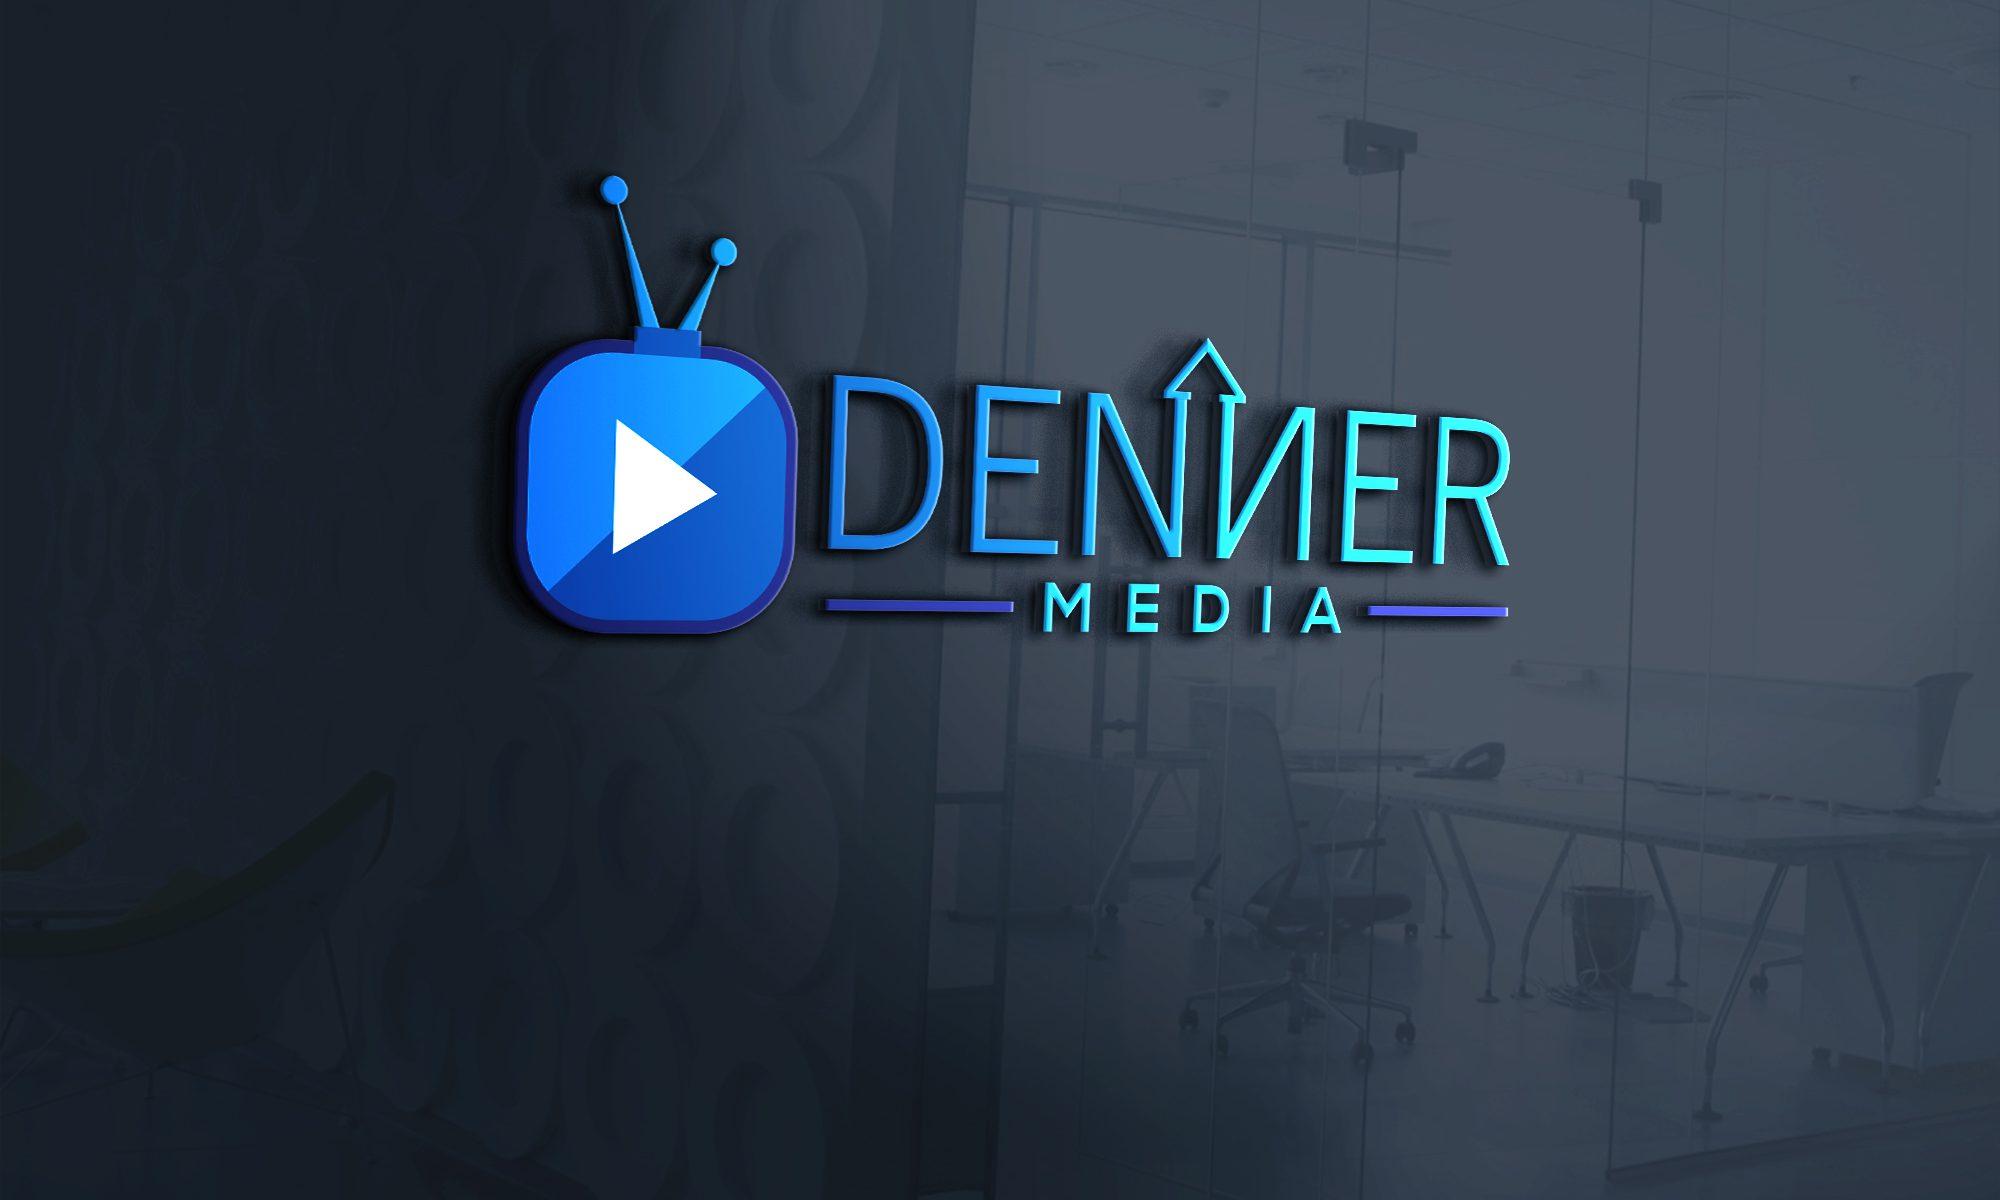 DENNER Media